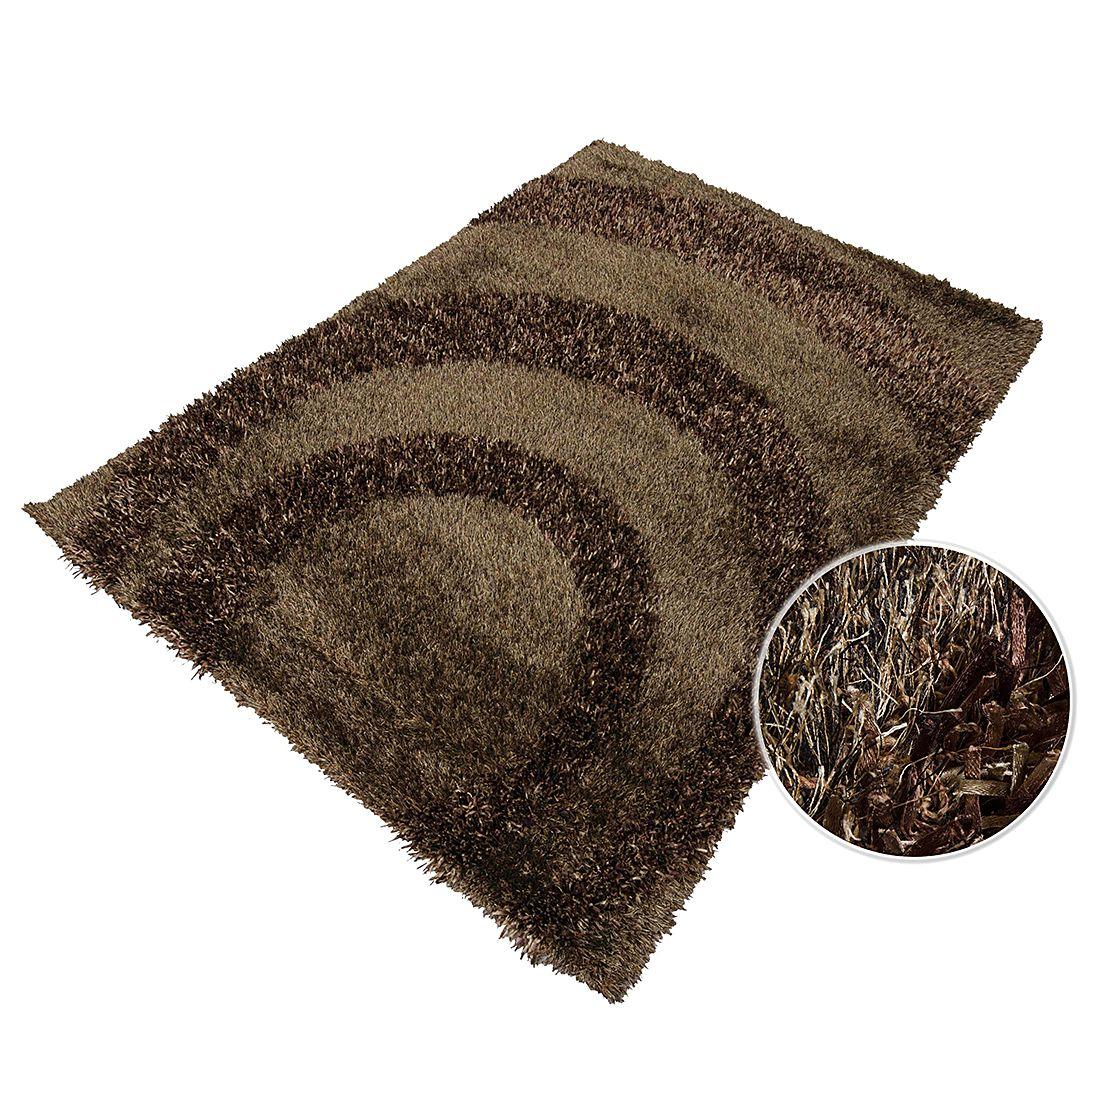 teppich hochflor design braun 160 x 230 cm home24 deko. Black Bedroom Furniture Sets. Home Design Ideas